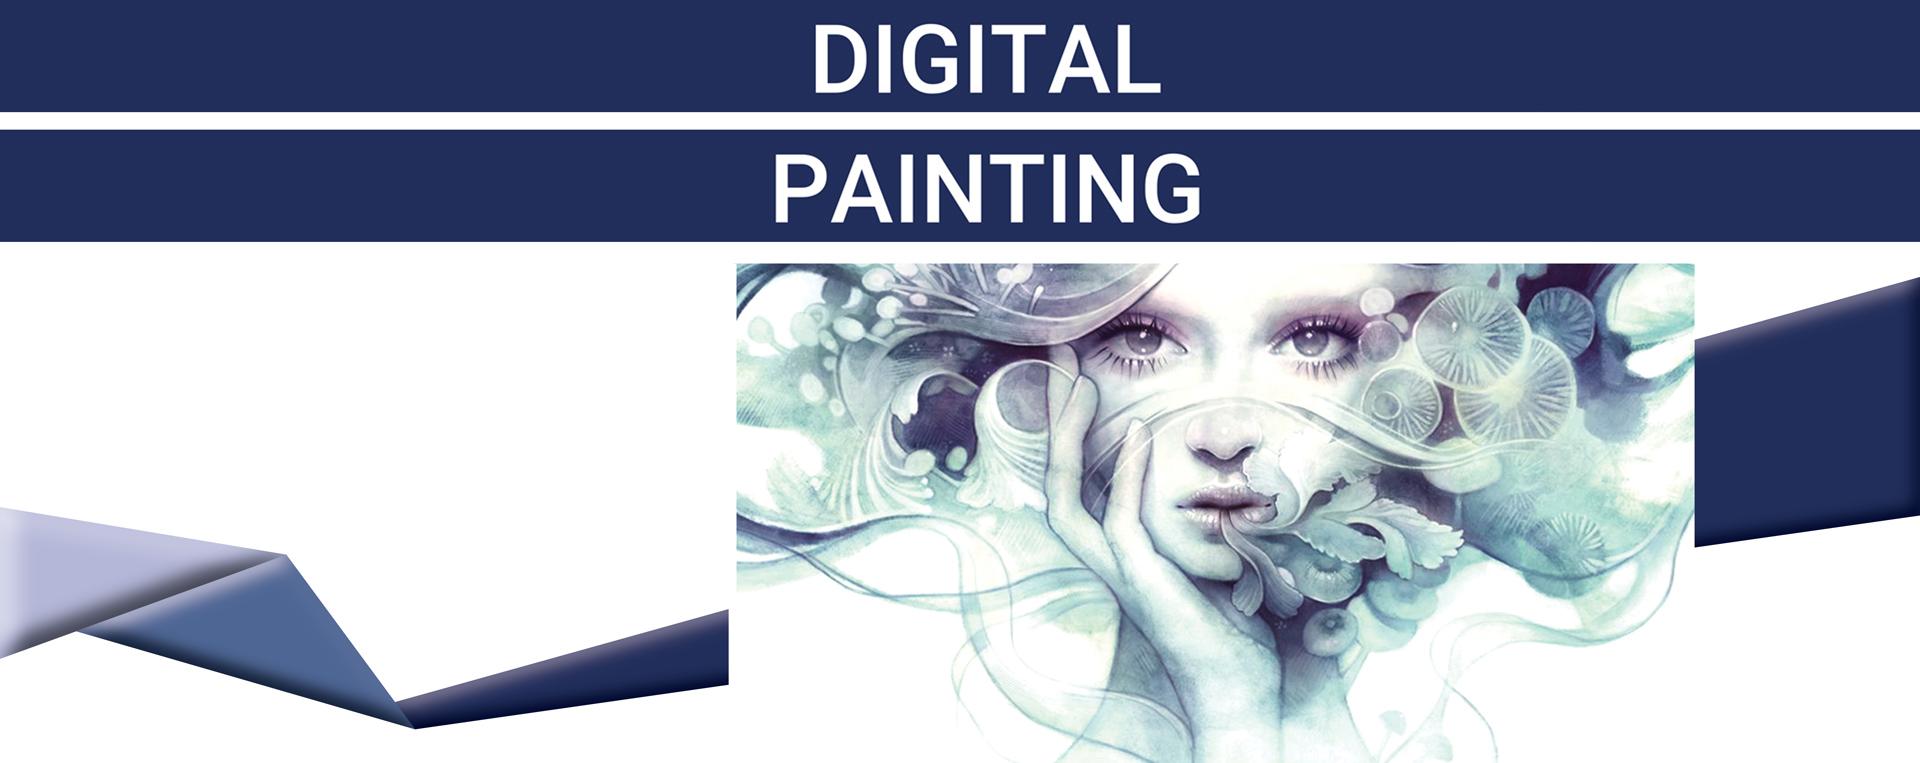 hedare final 2 - نقاشی دیجیتال ، دیجیتال پینتیگ